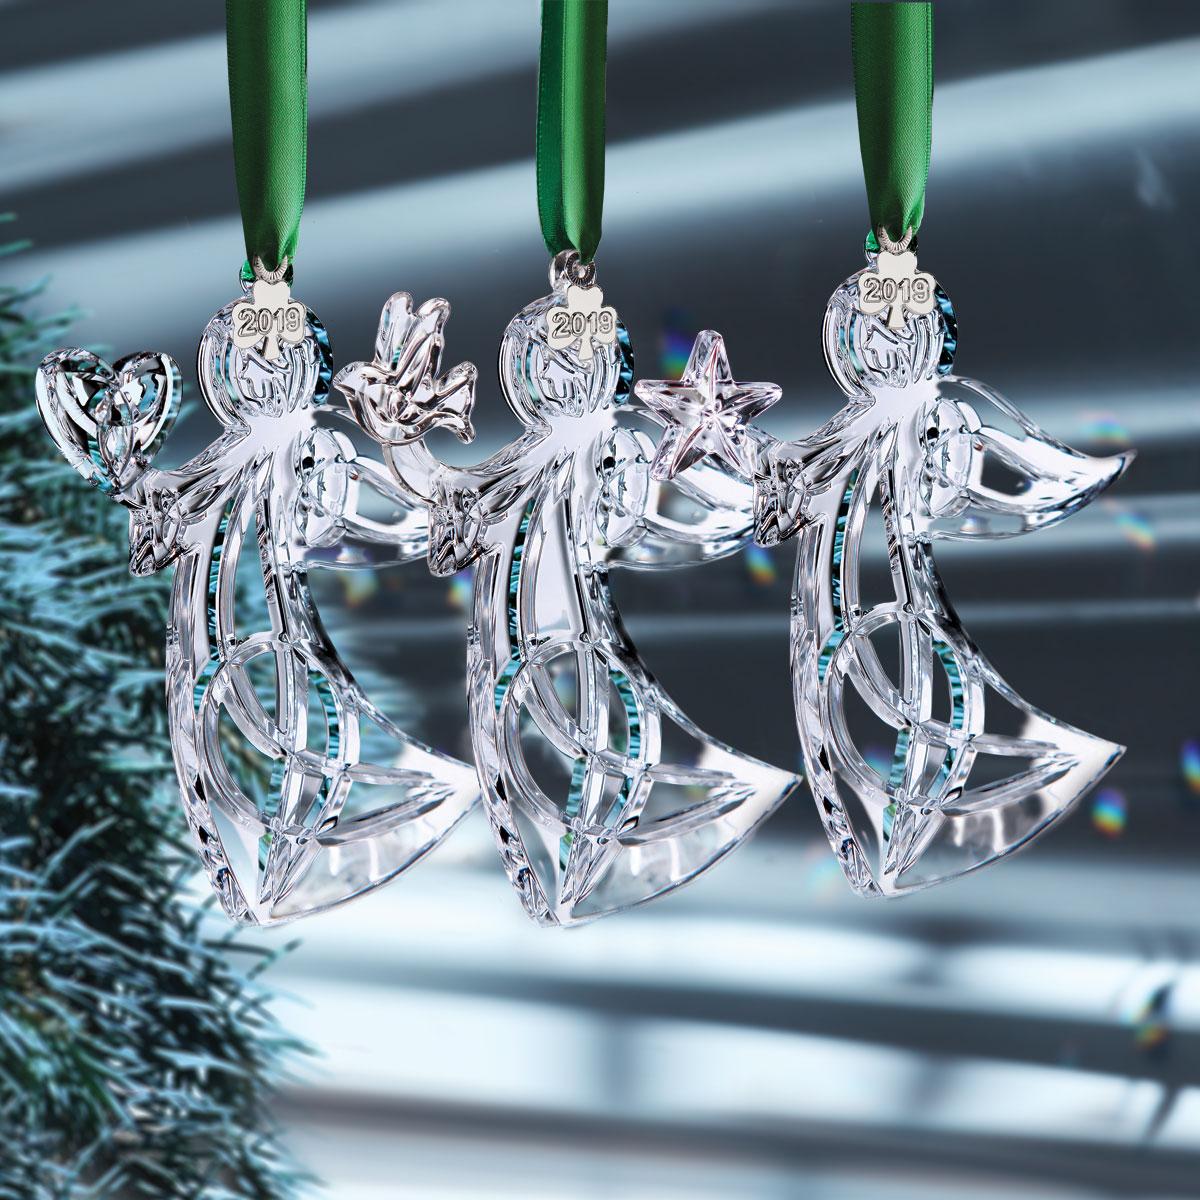 Cashs Ireland, 2019 Three Sisters Angel Ornament Set